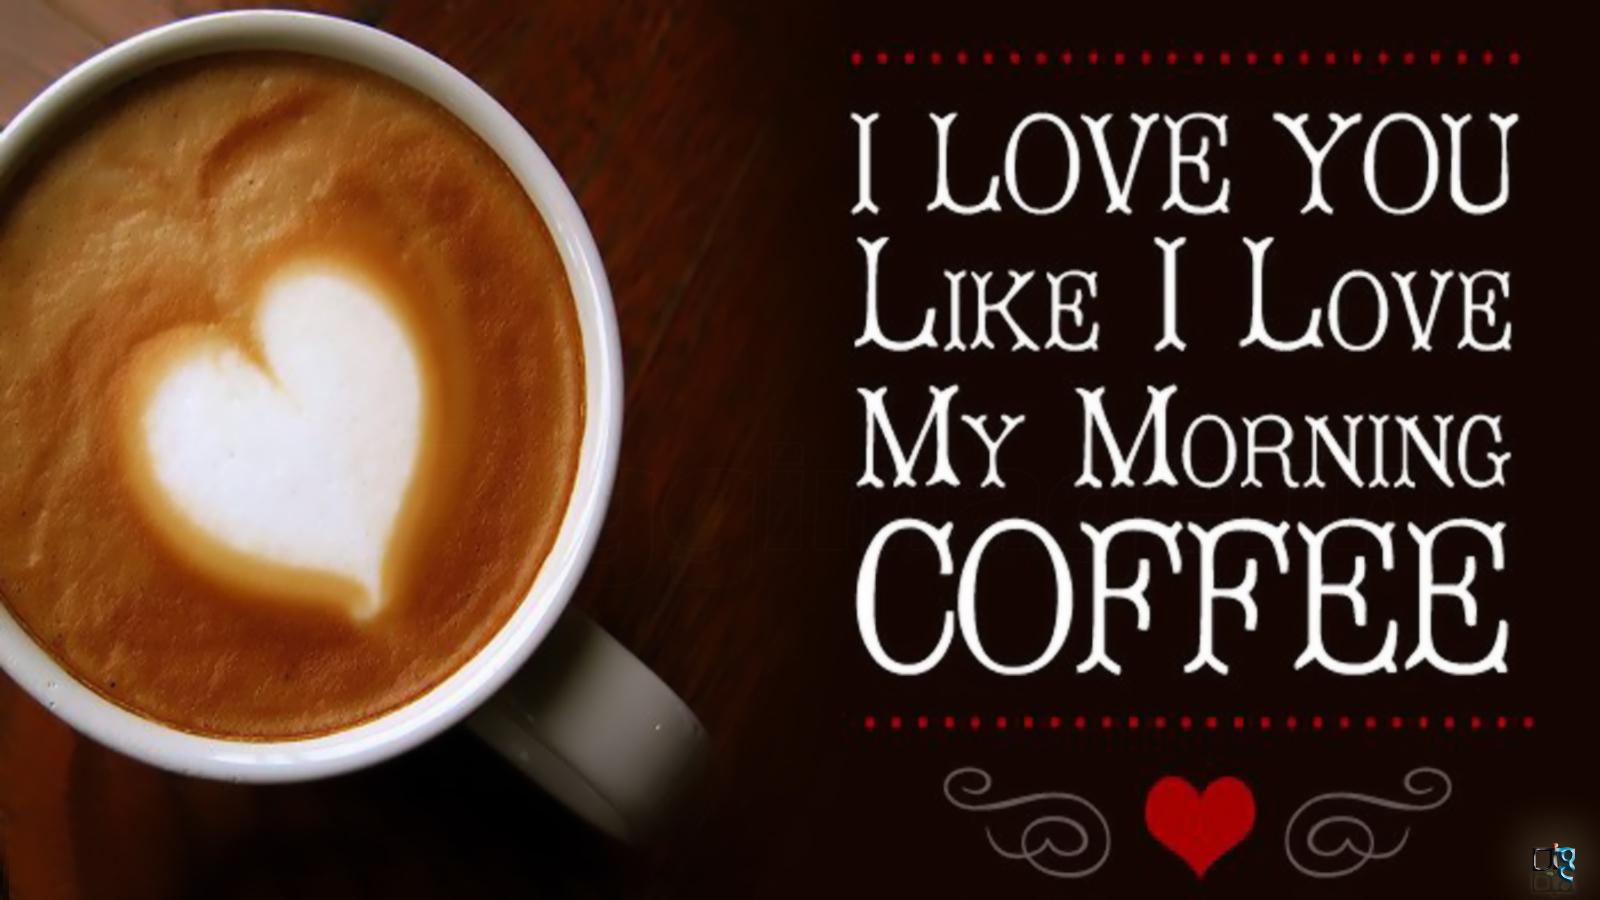 Good Morning Coffee Pics: D I G G I M A G E: Good Morning